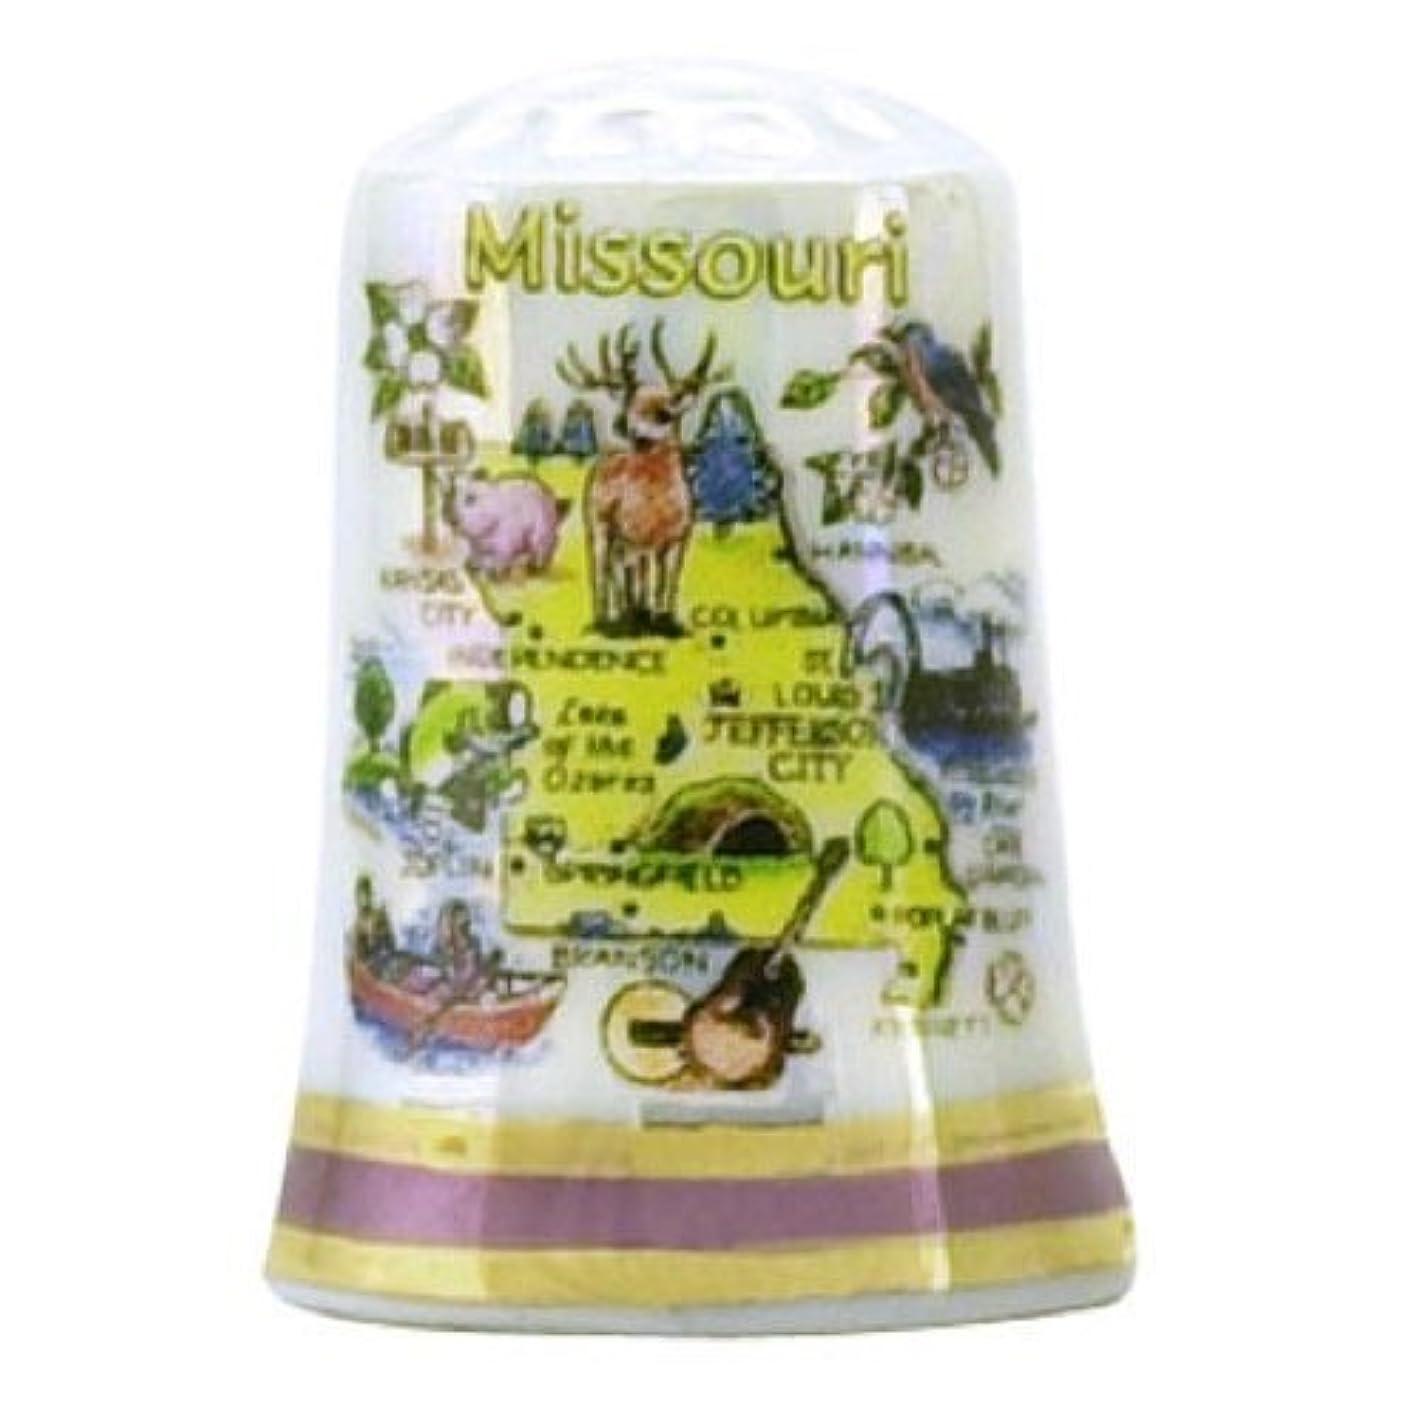 Missouri State Map Pearl Souvenir Collectible Thimble agc